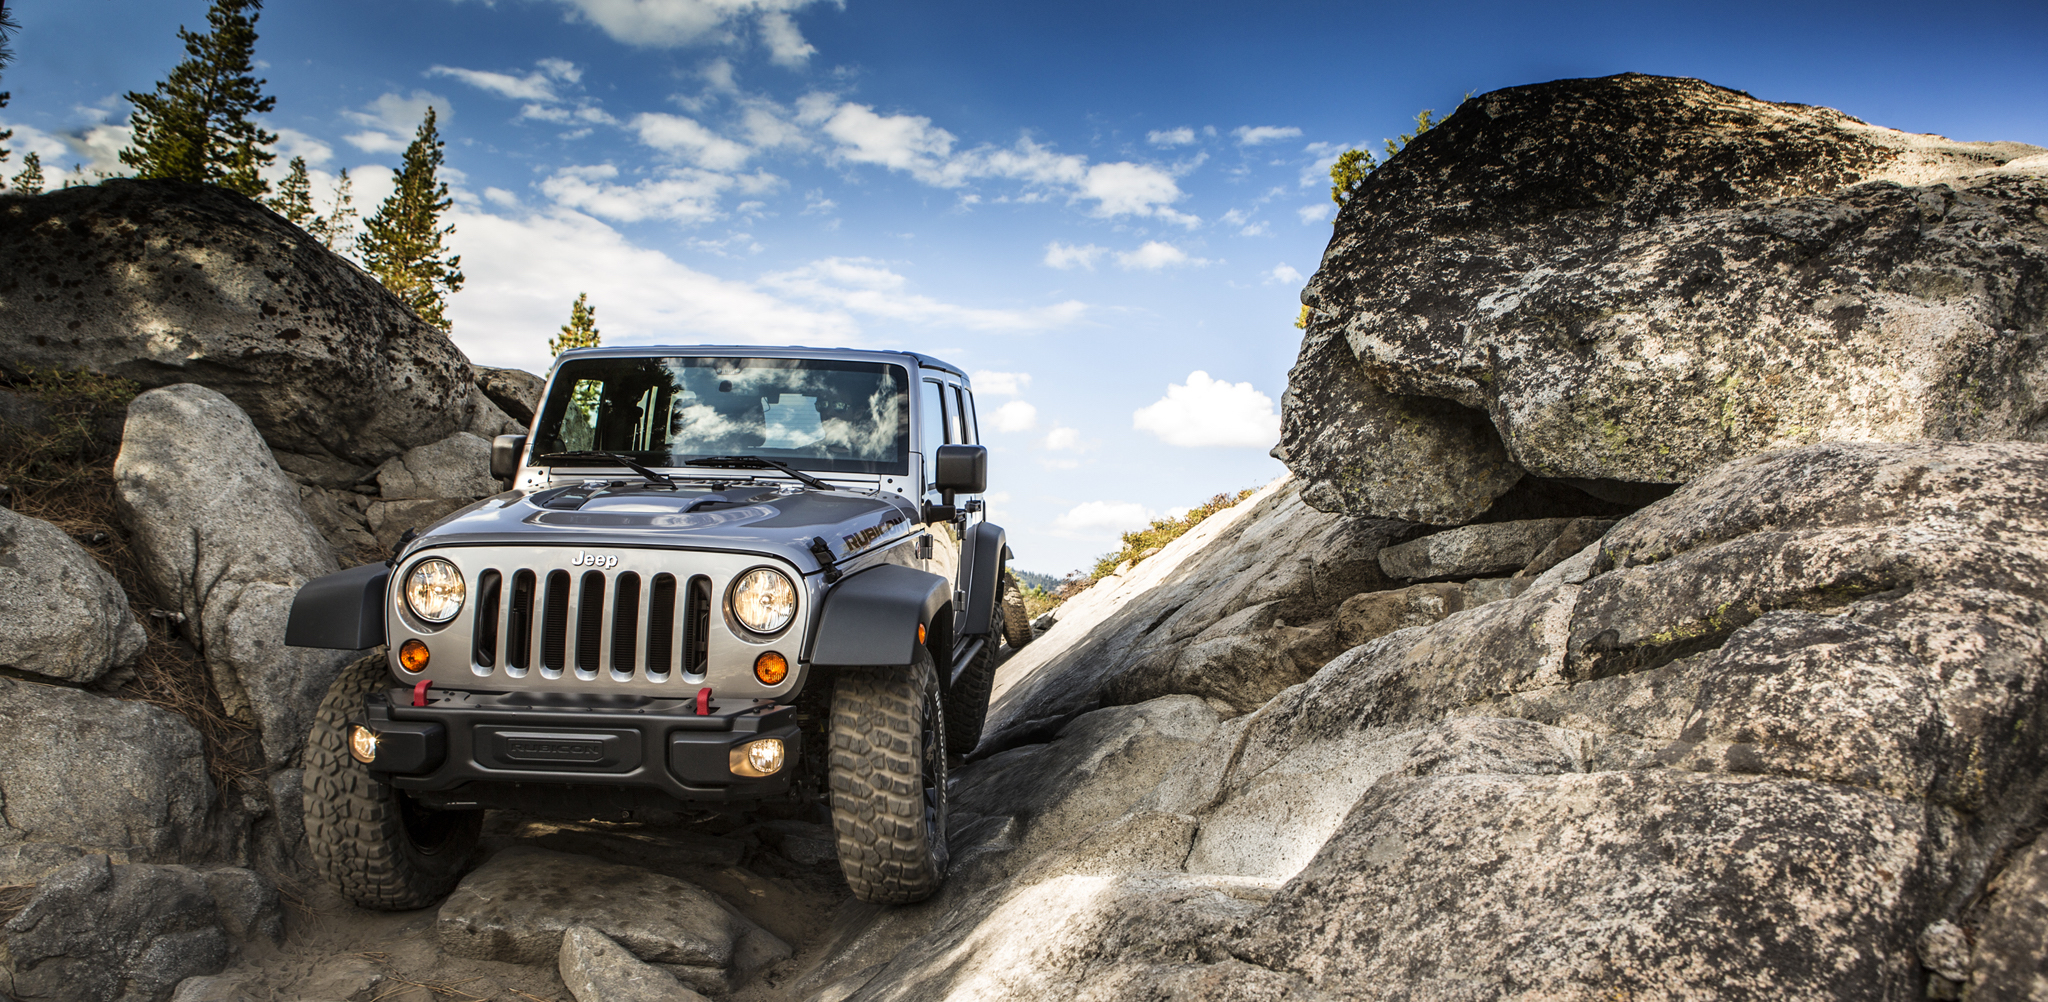 Silver 2013 Jeep Wrangler rock crawling